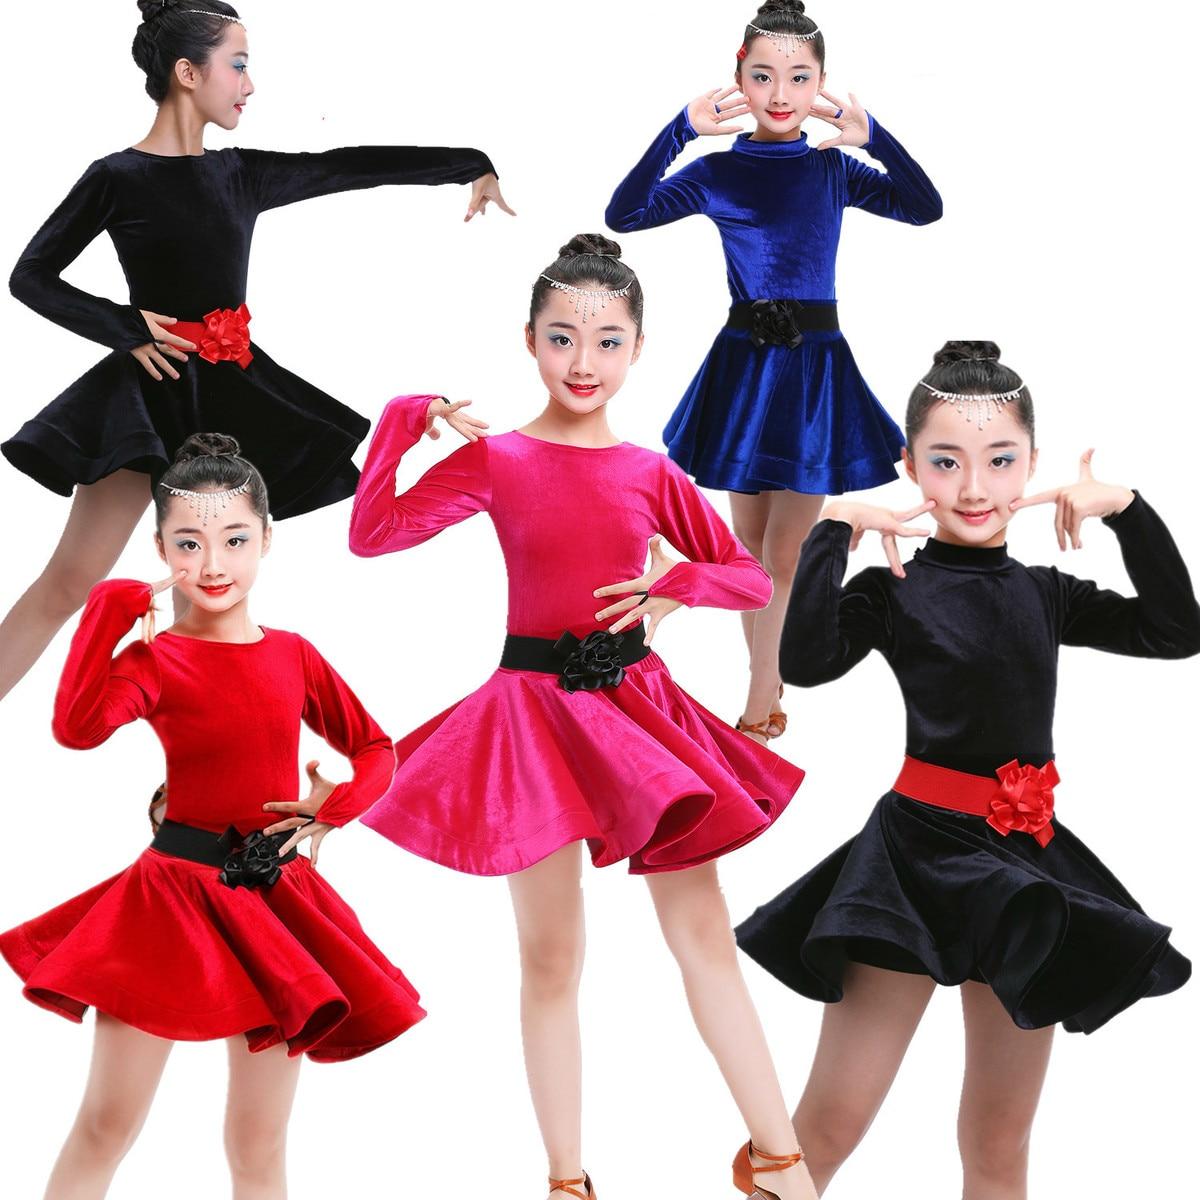 Dance Costume Patterns Best Inspiration Design